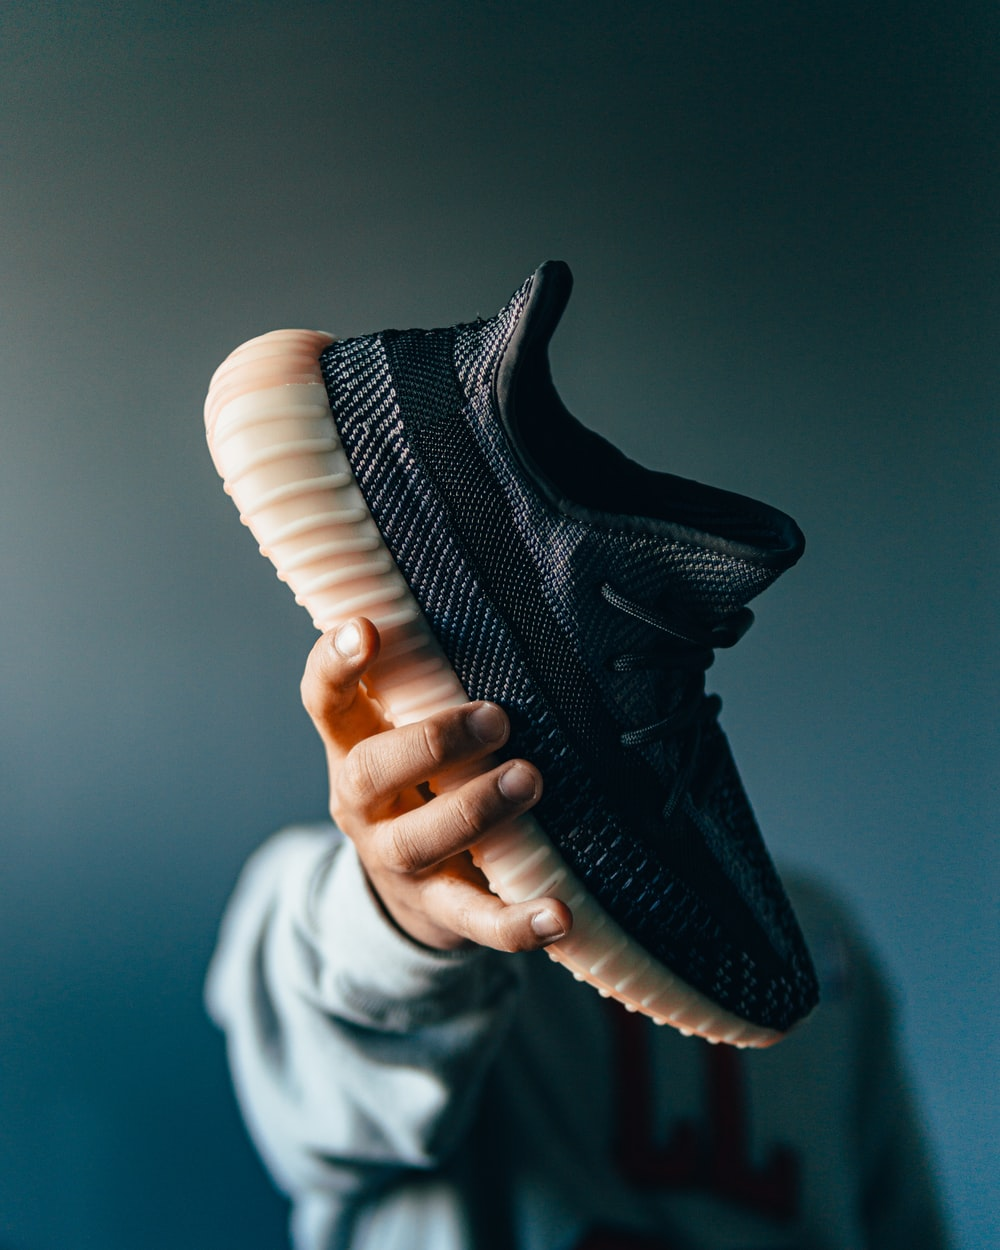 person holding black nike athletic shoe